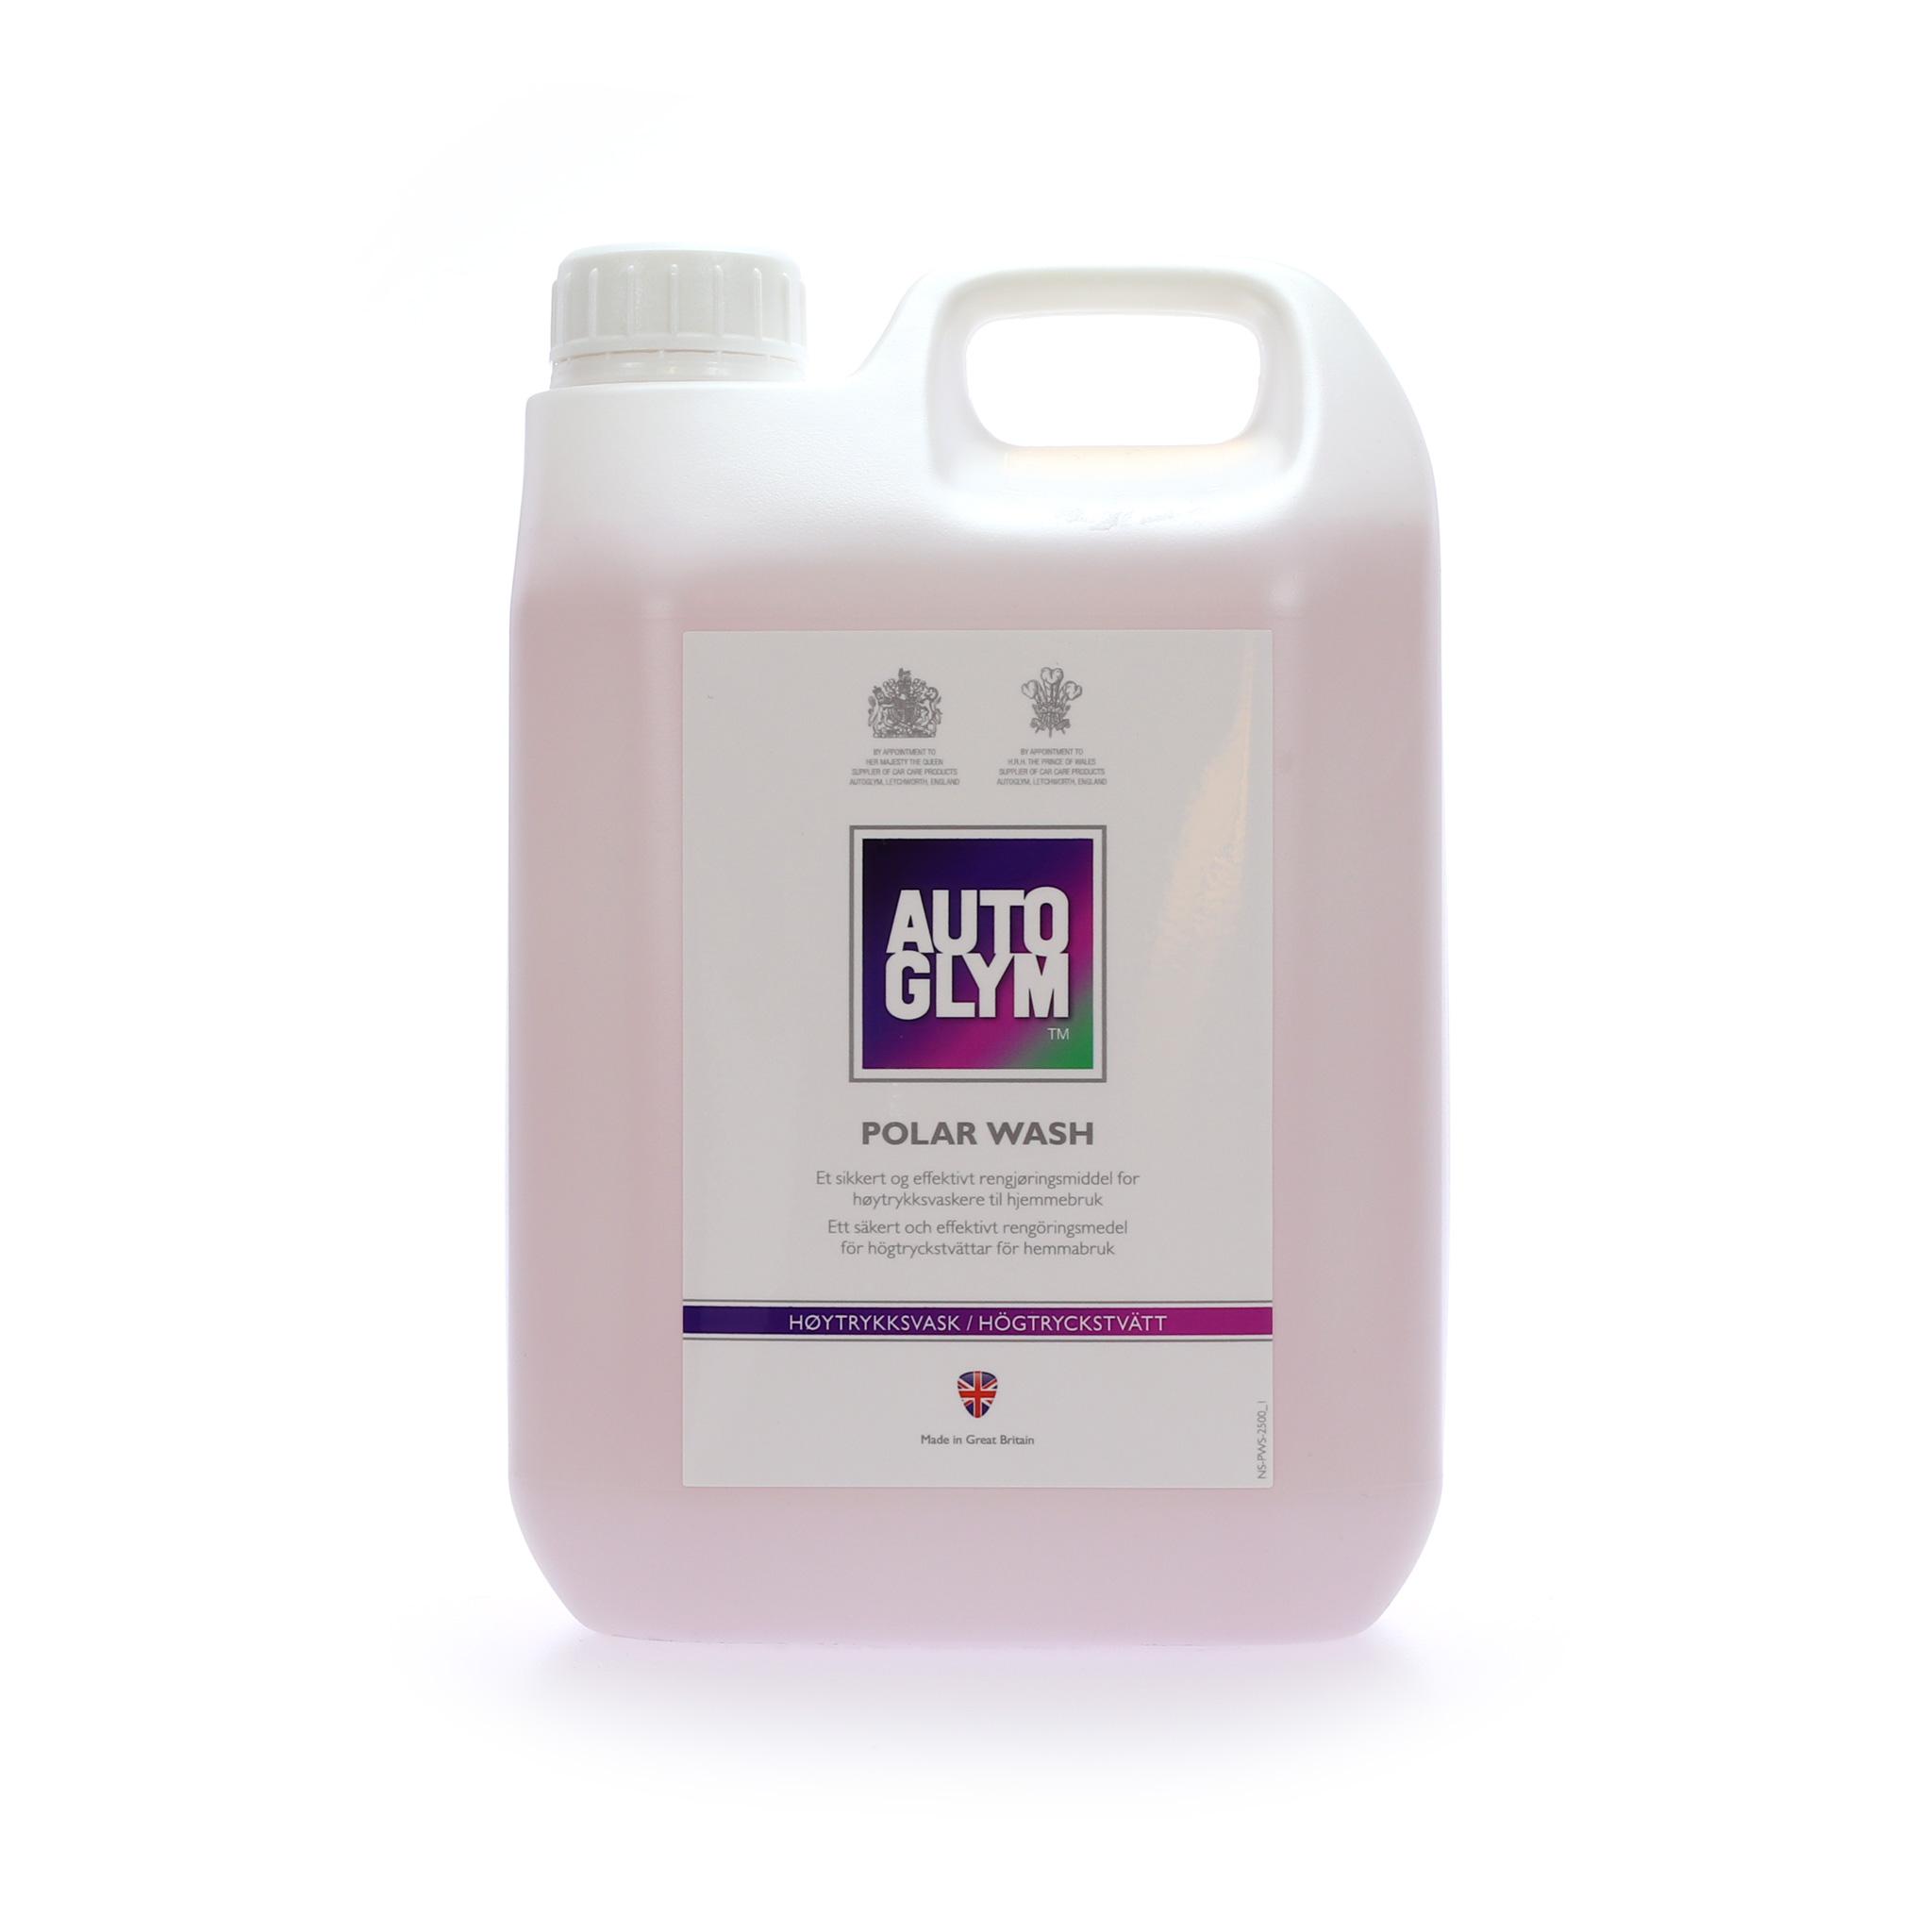 Bilschampo Autoglym Polar Wash, 2500 ml